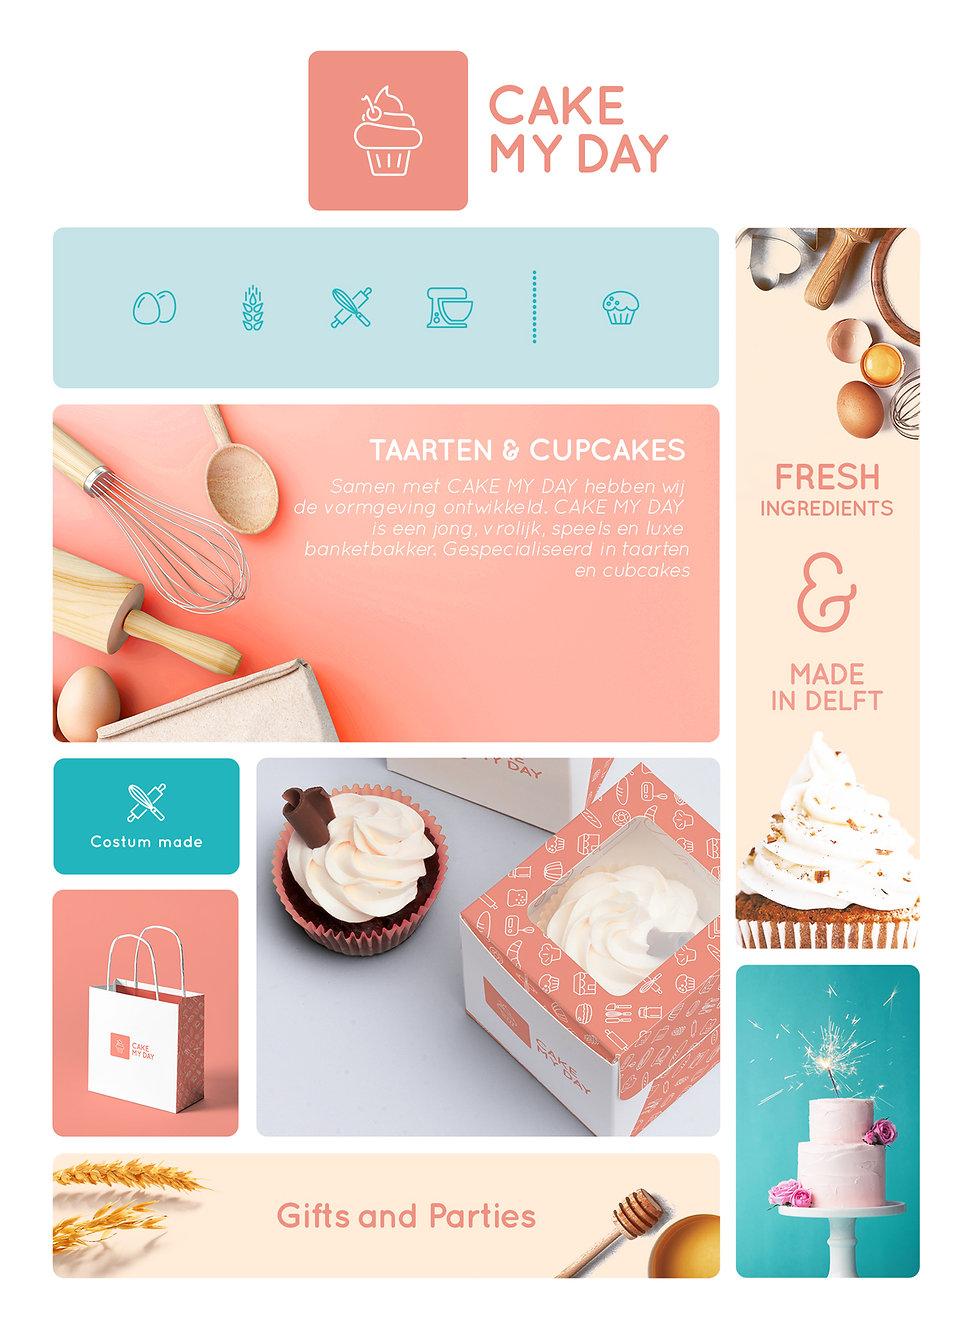 Make My Day - Bakery Store.jpg